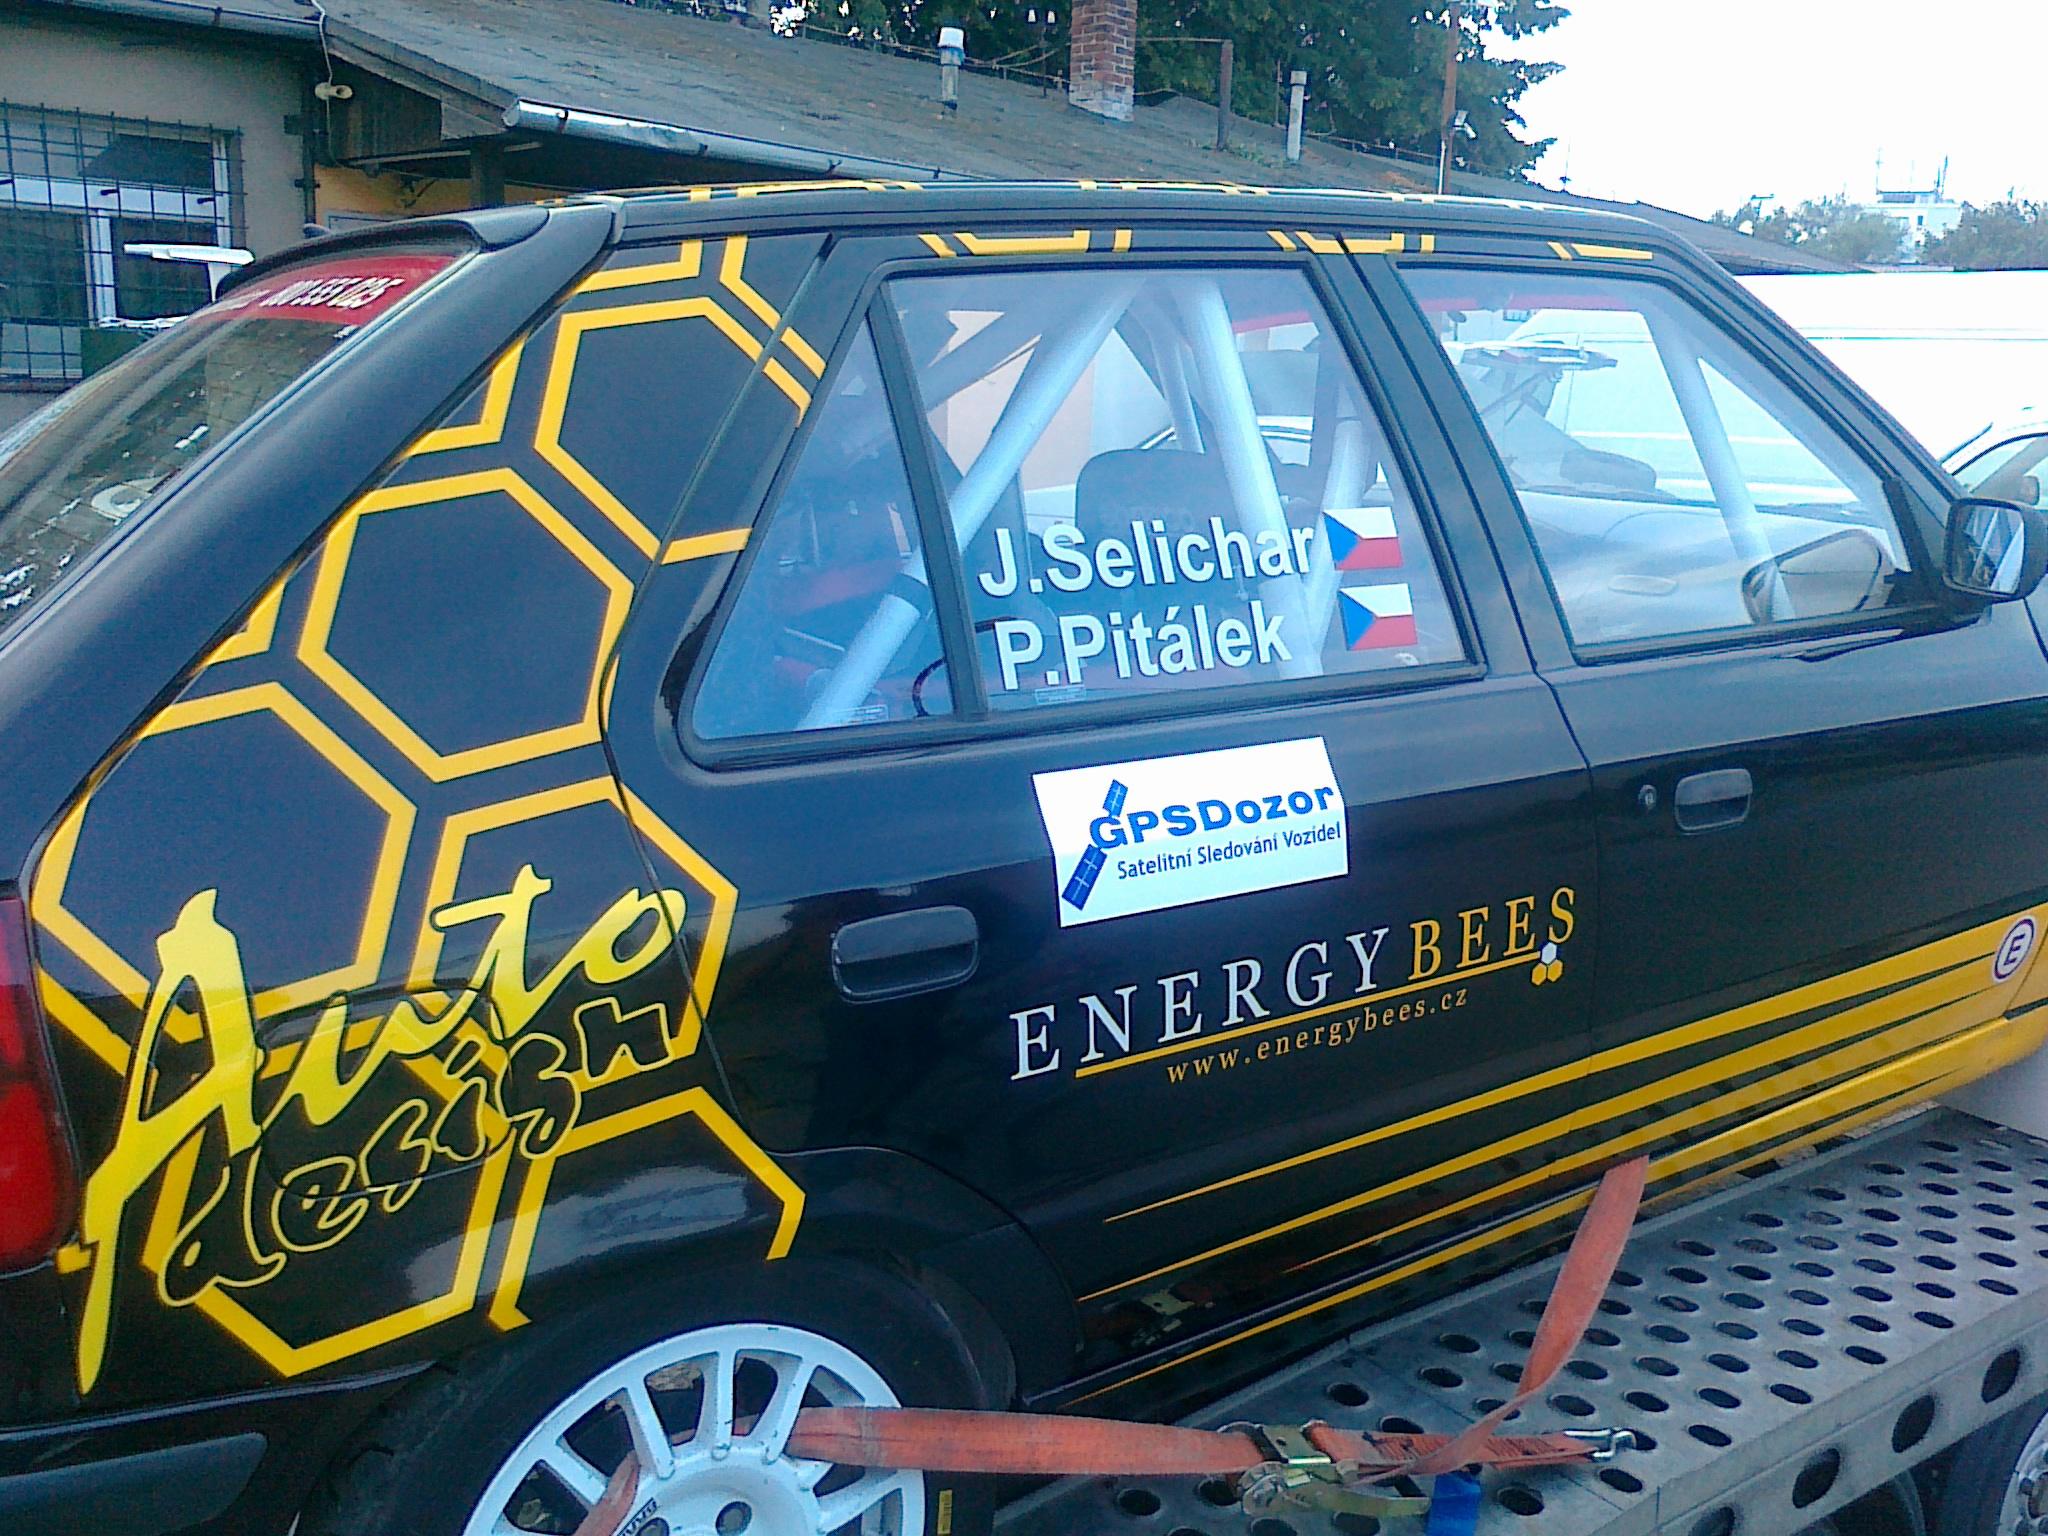 Sledované vozidlo připraveno na převoz na Rally Agropa Pačejov 2013